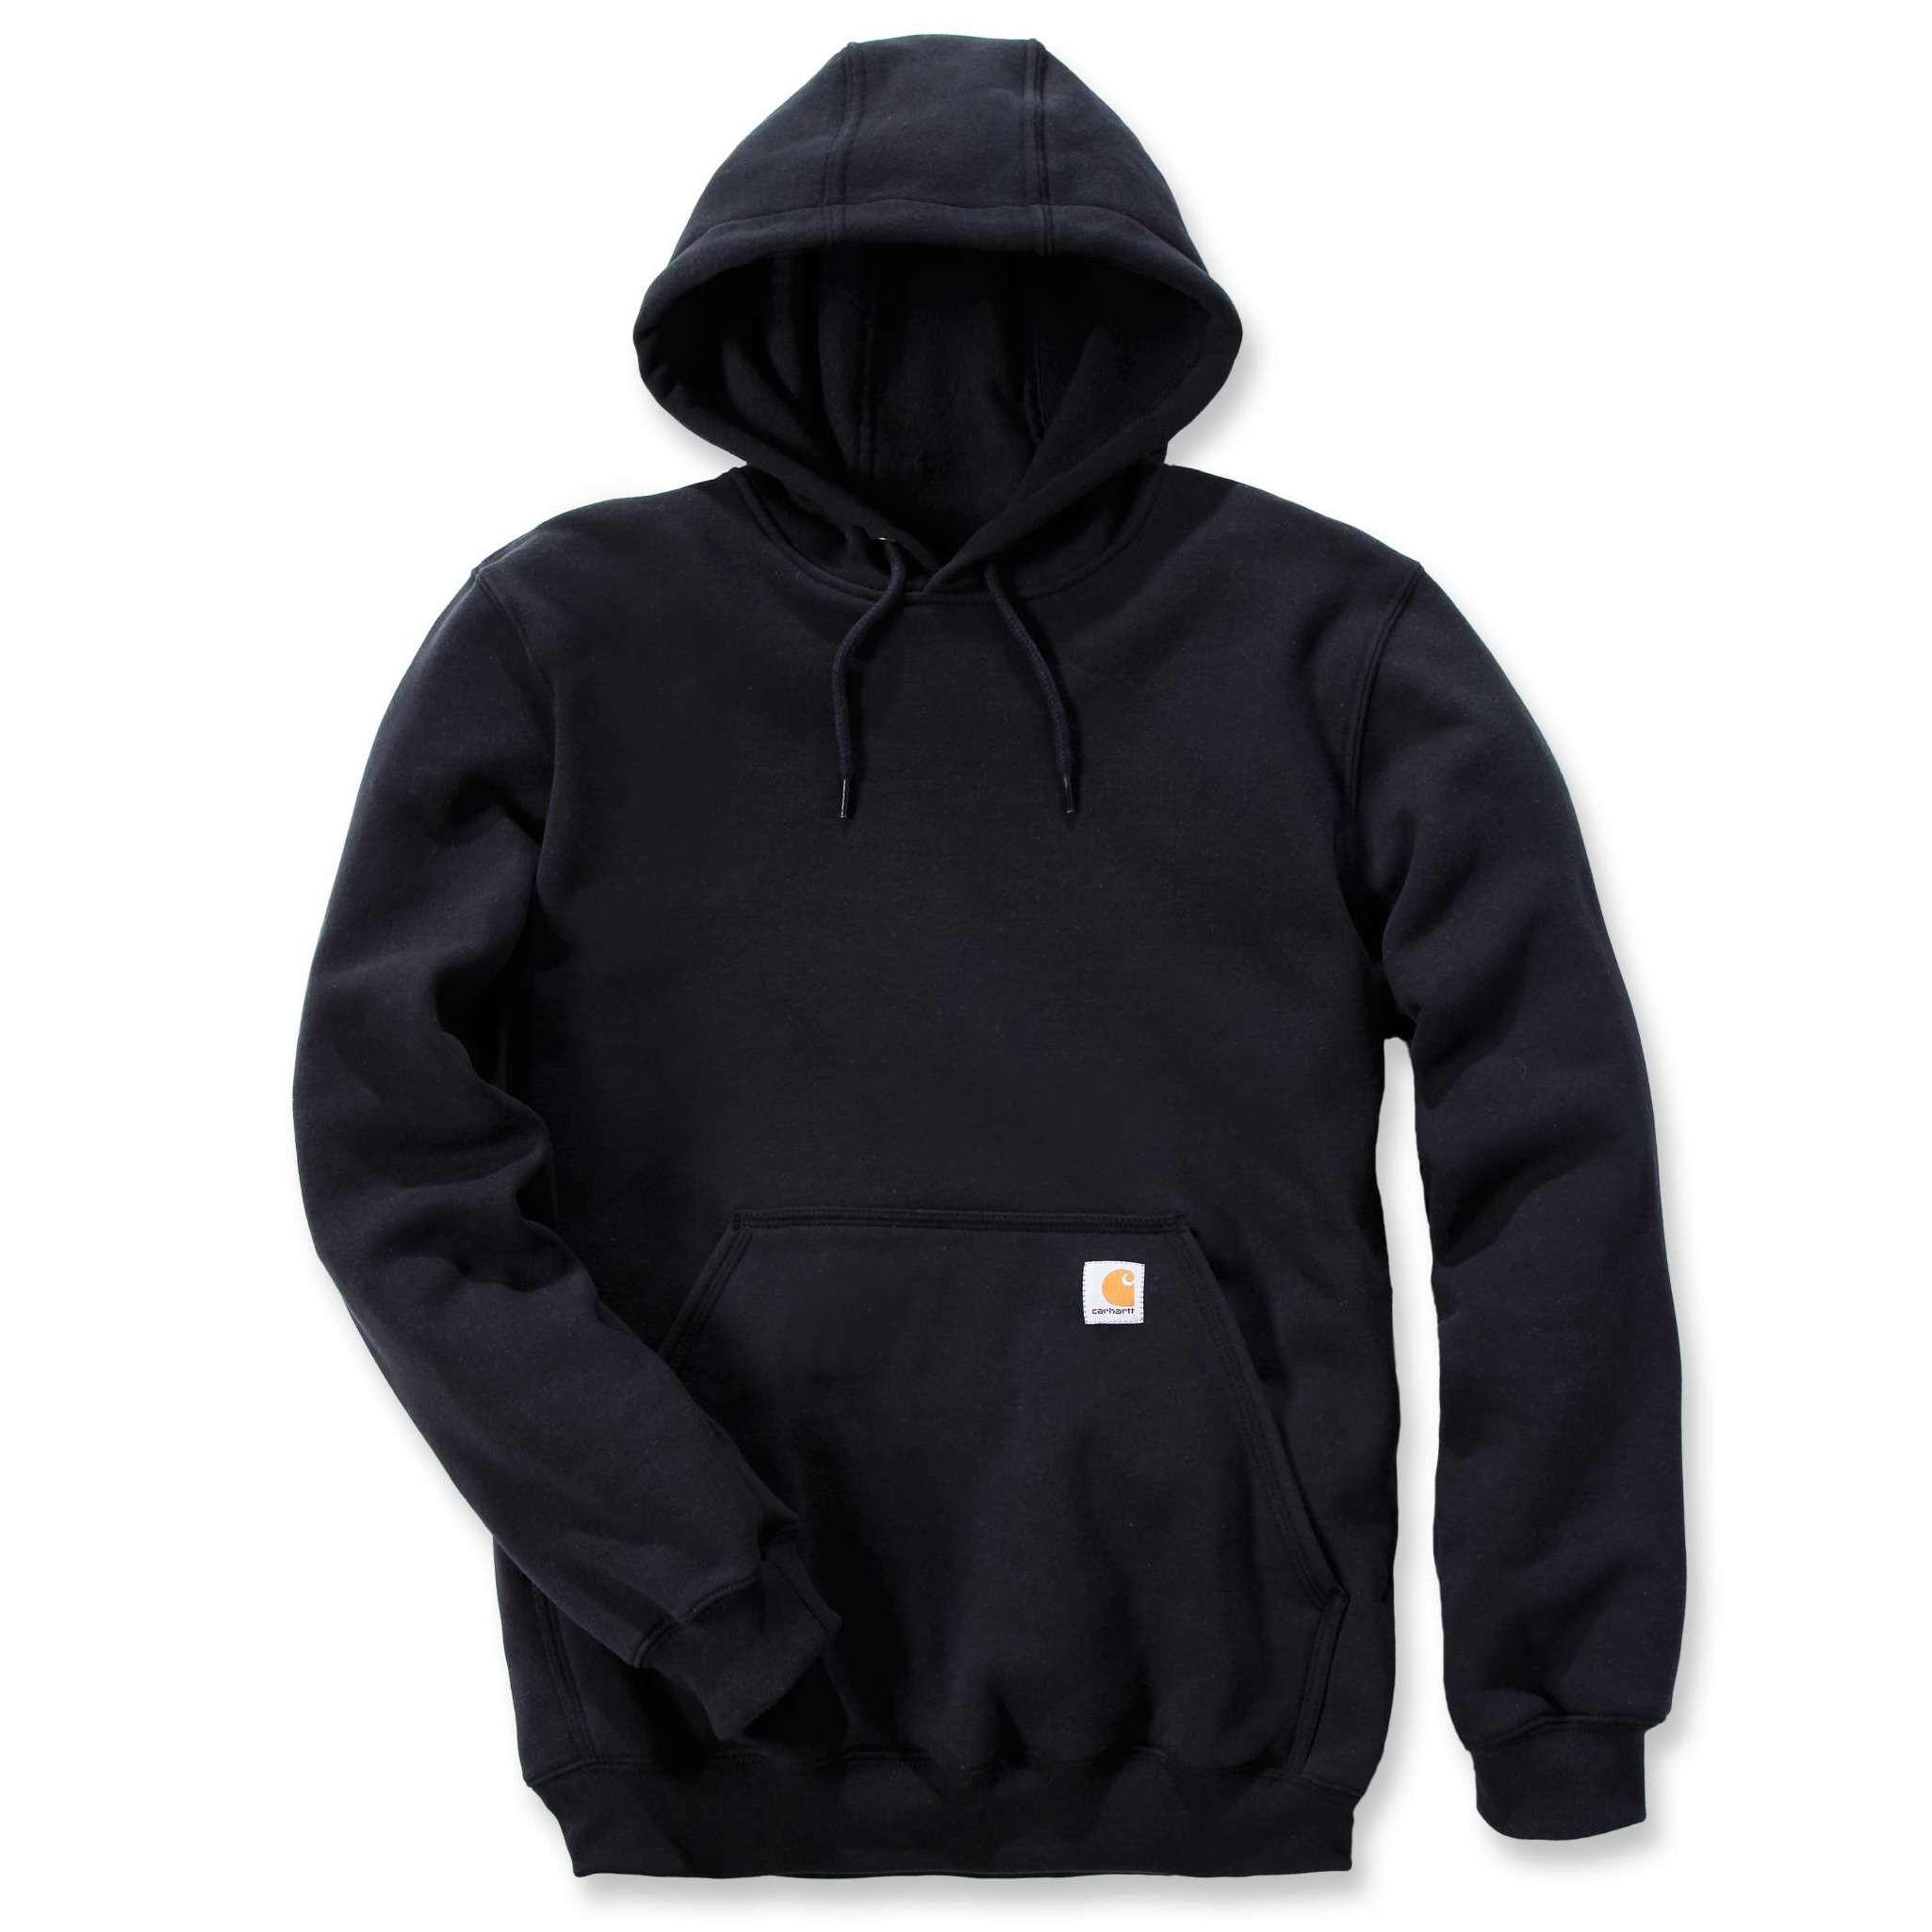 Худи Carhartt Hooded Sweatshirt - K121 (Black, S)